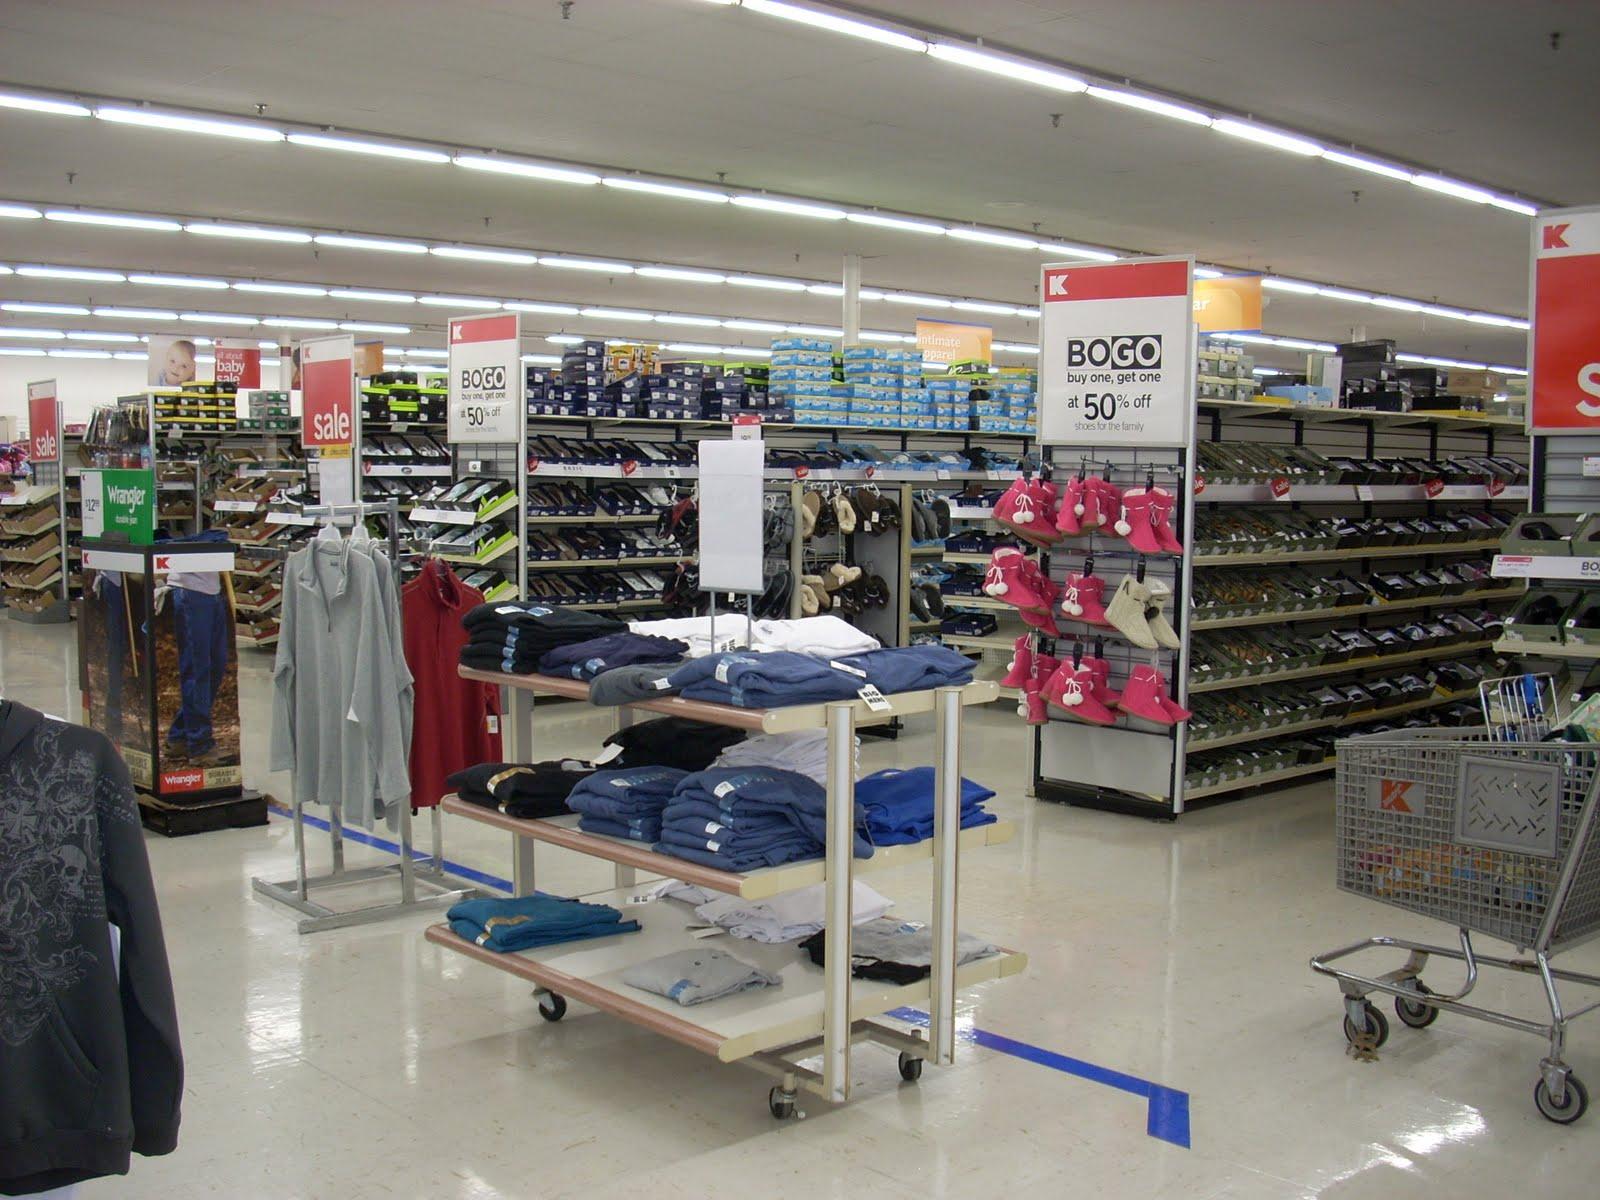 Super Kmart Blog Hendersonville Tn Big Kmart Super Kmart Blog!: Hendersonville TN Big Kmart - 1600x1200 - jpeg